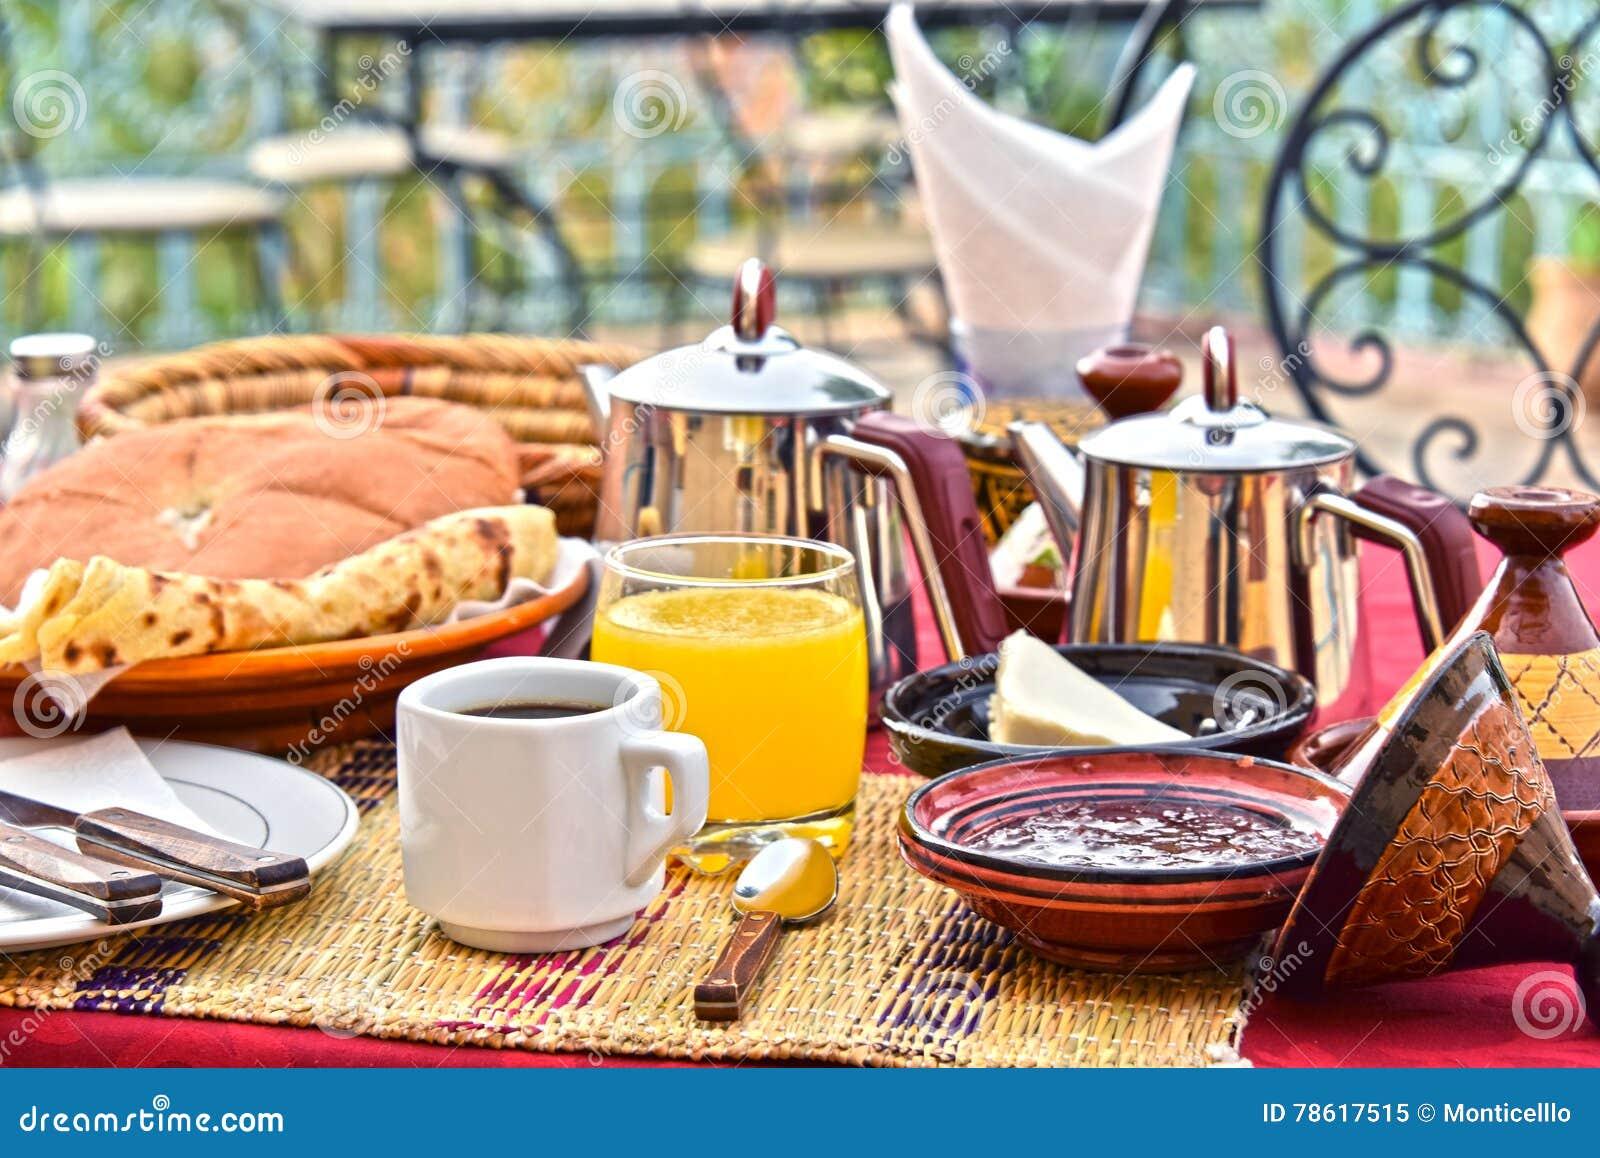 Moroccan breakfast served on hotel terace in Atlas Mountains